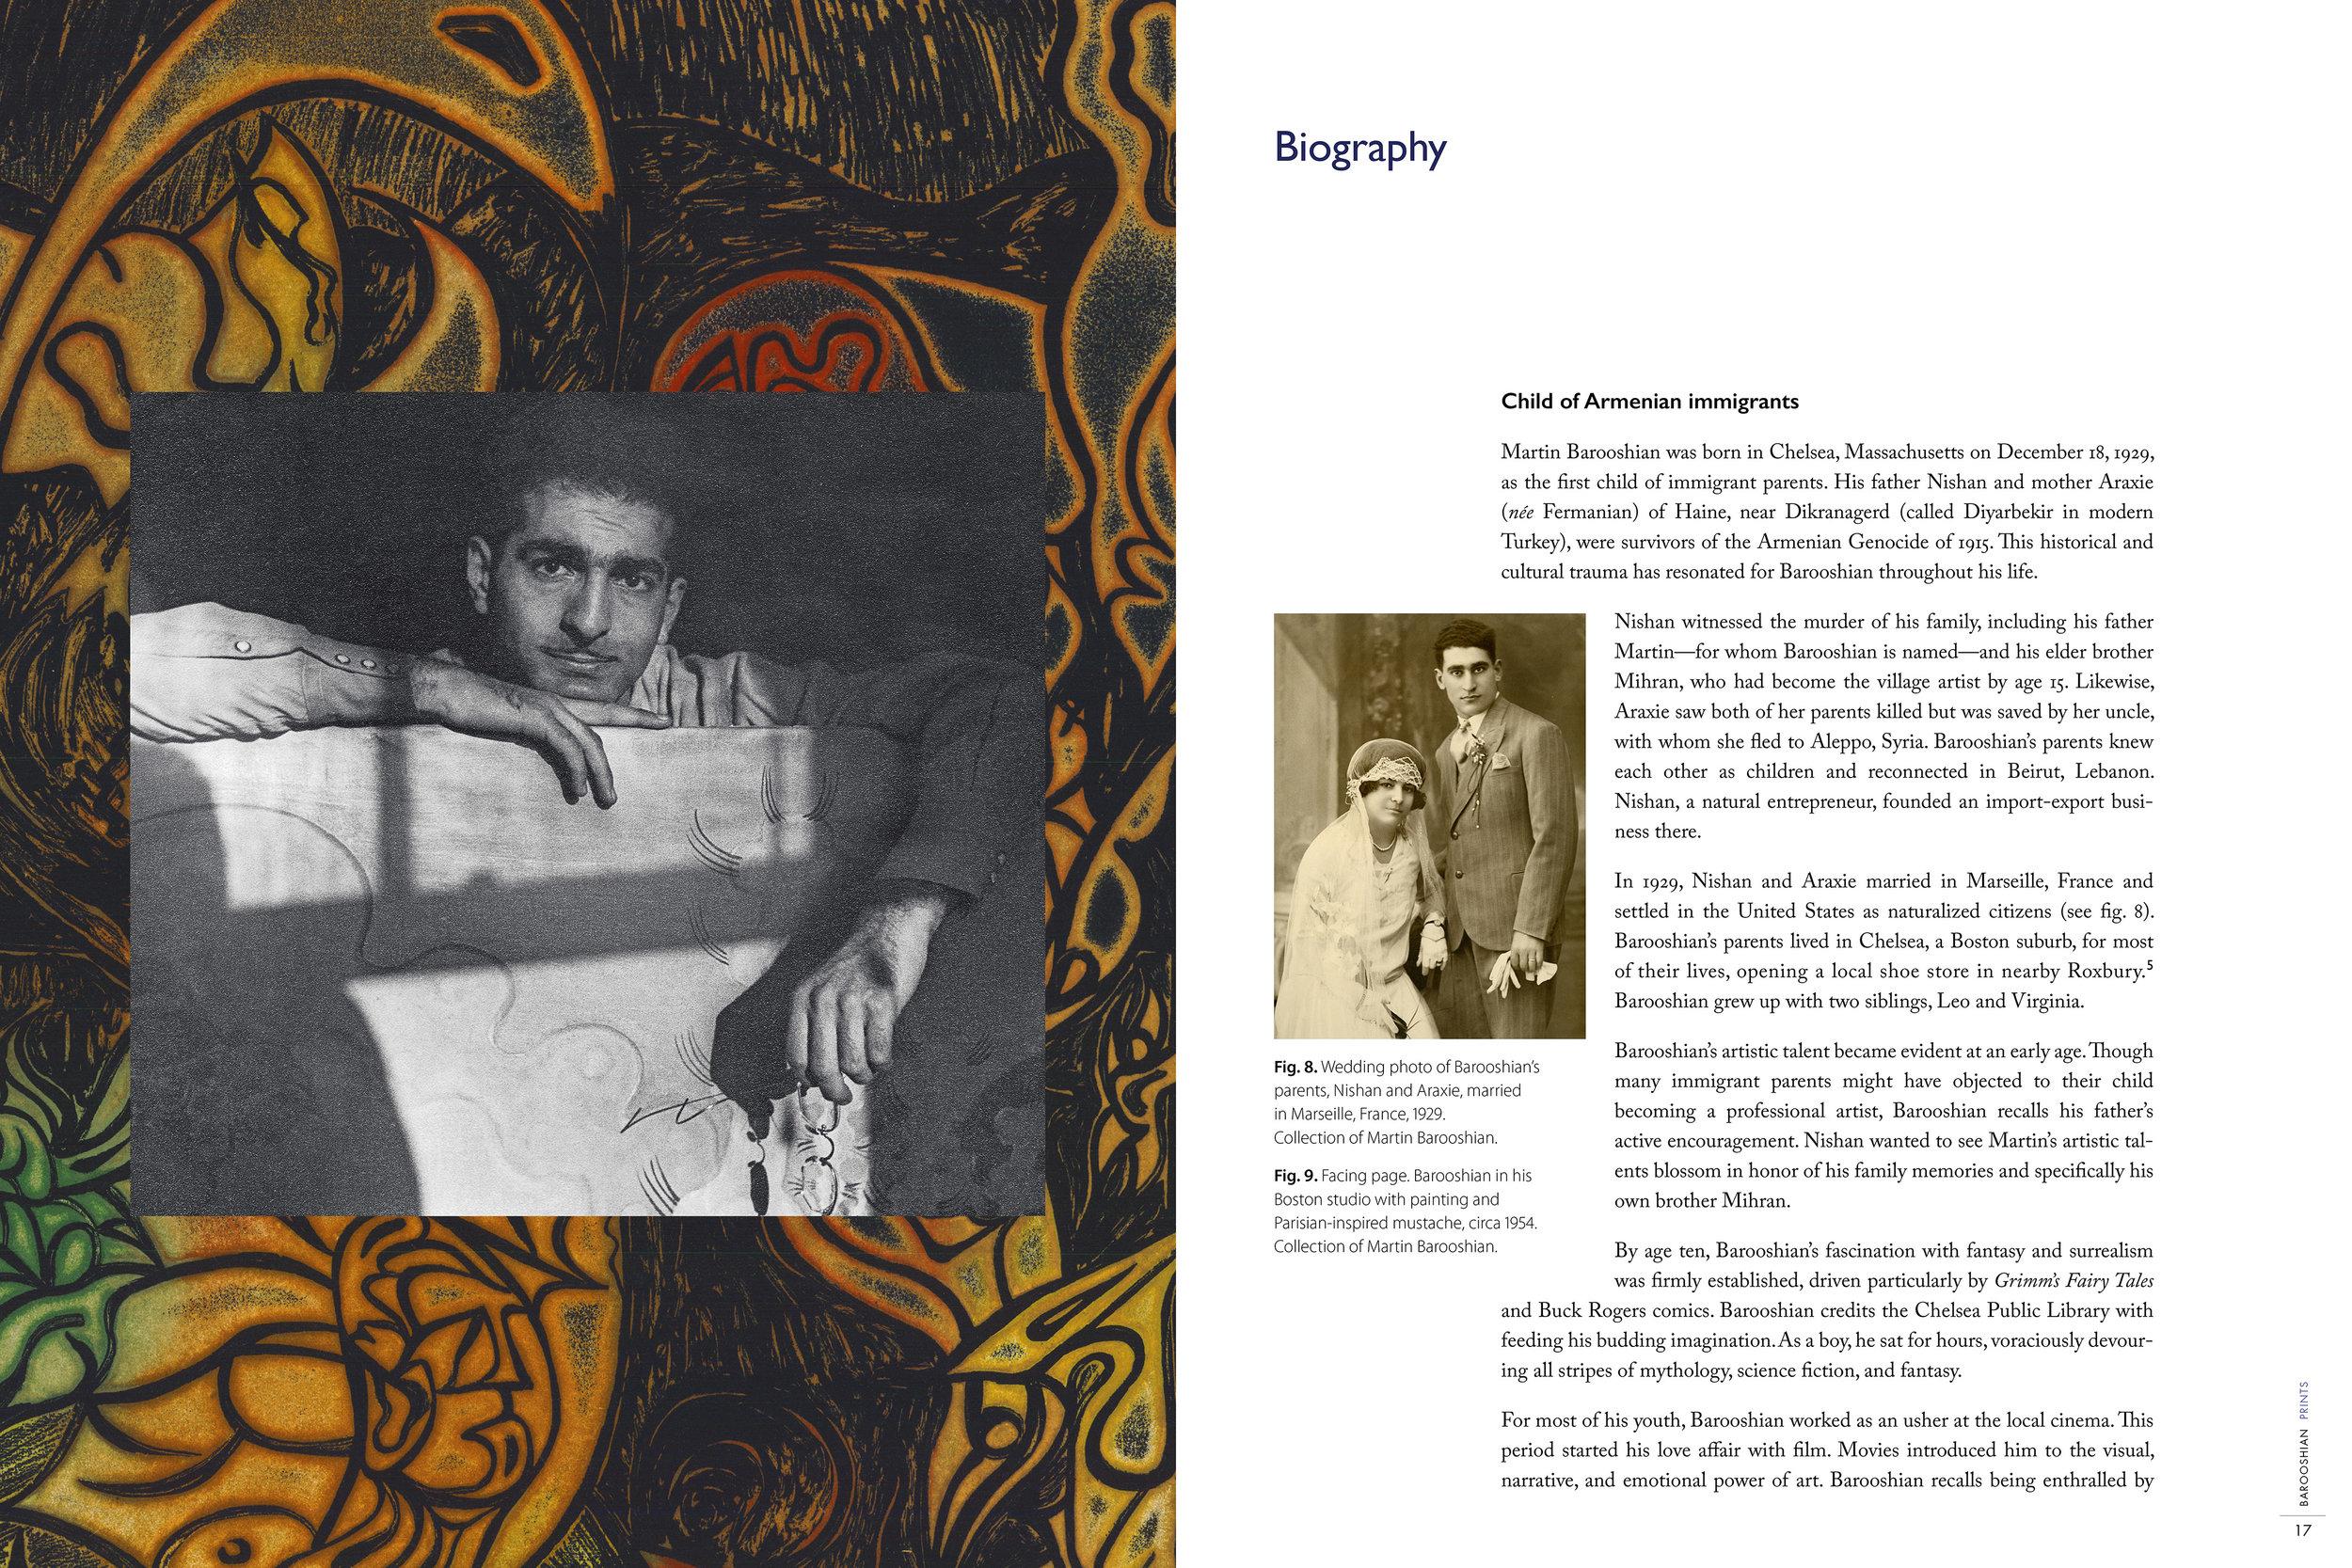 Barooshian_book-tbd-pp16-17lrgmed.jpg